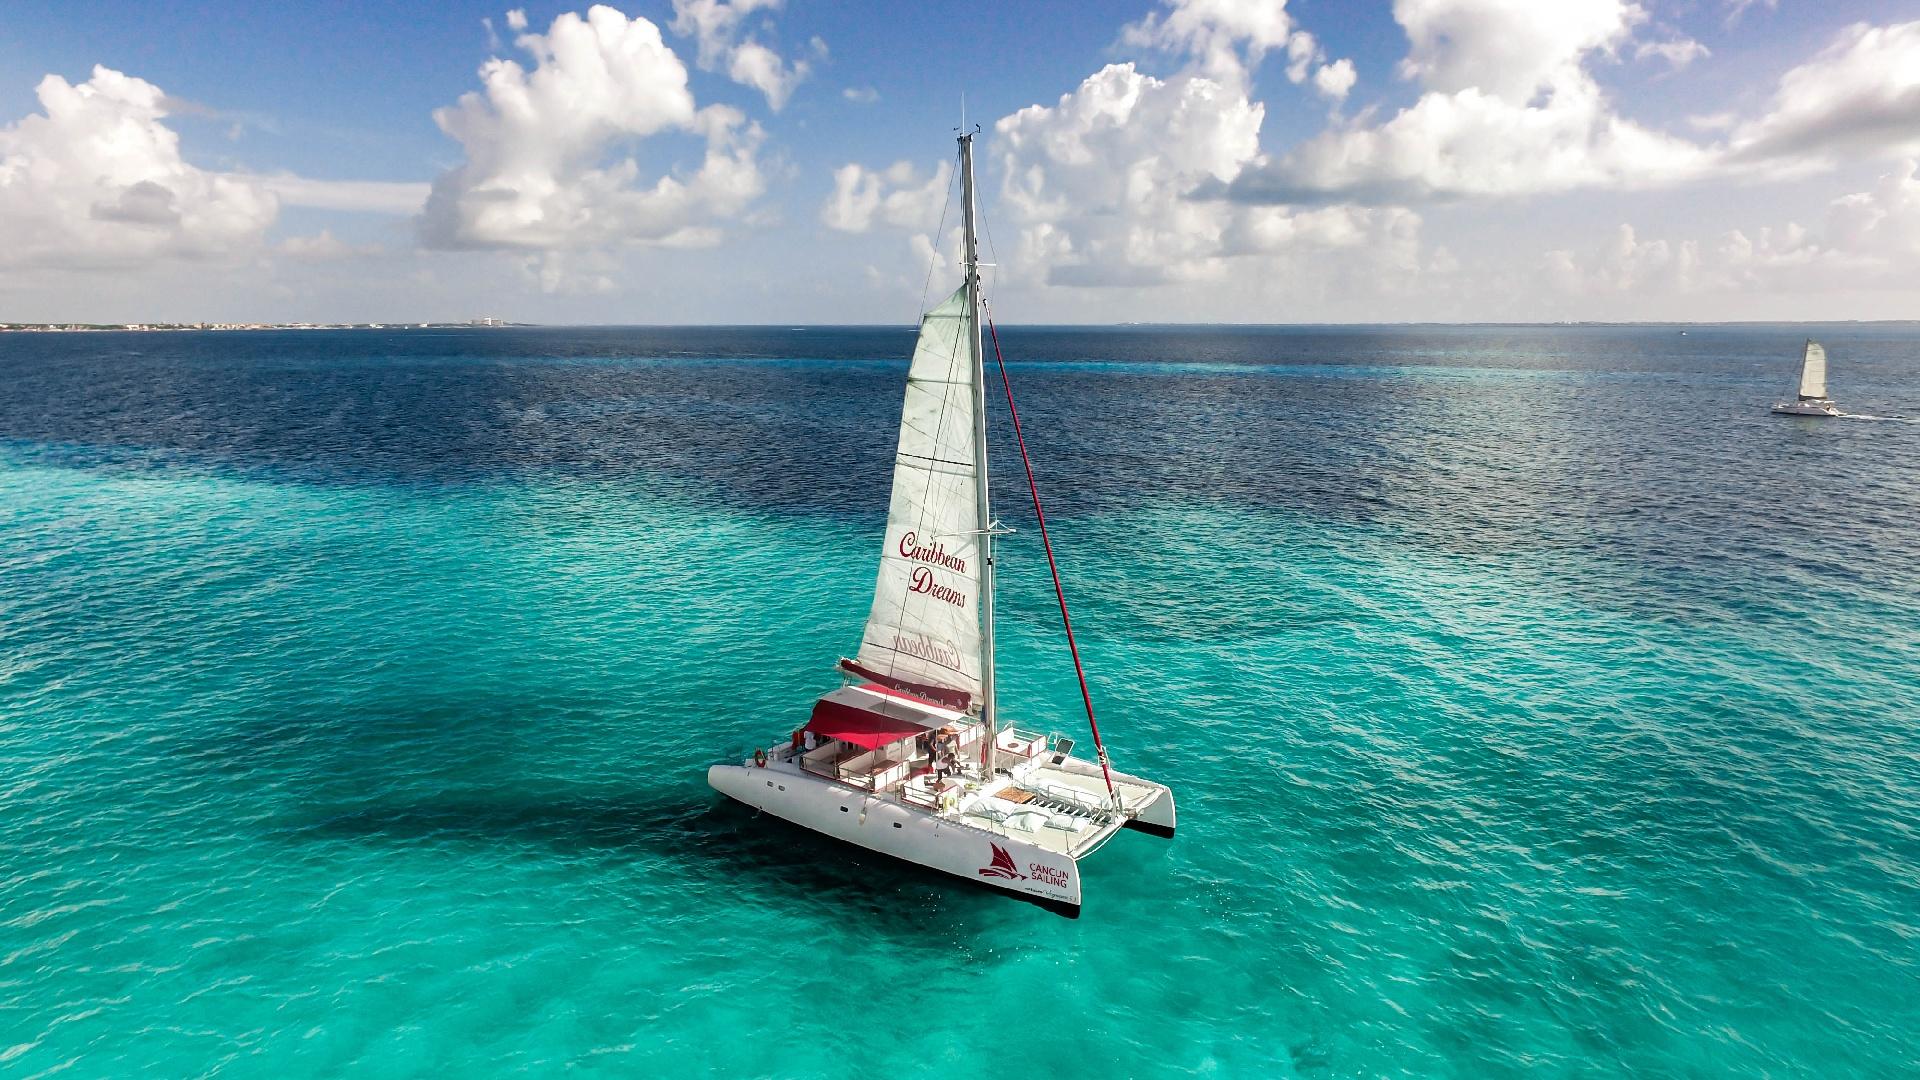 06 LoRes - Caribbean Dreams - Full Experience Isla Mujeres Tour - Cancun Sailing